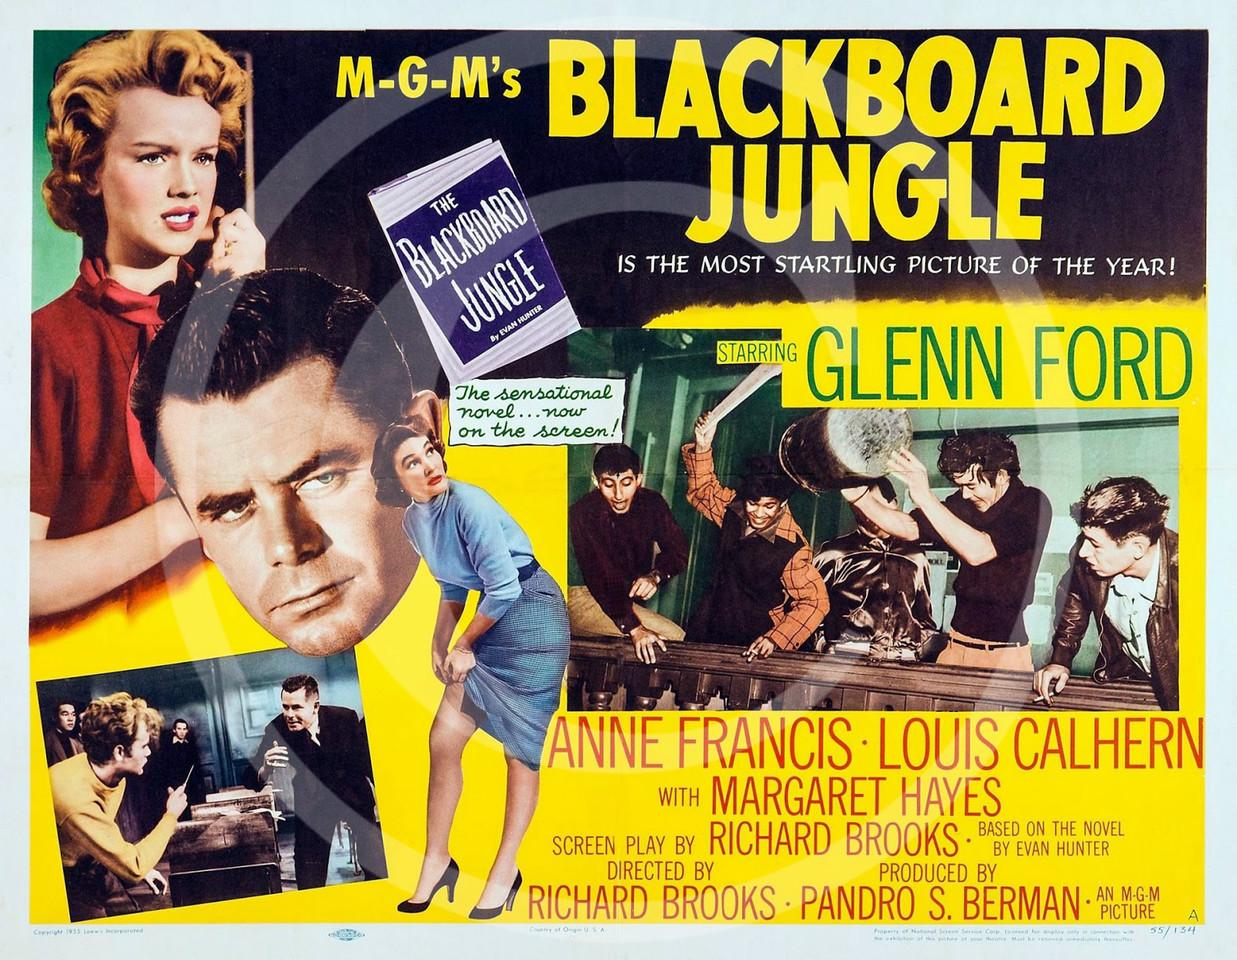 Blackboard Jungle 1955.